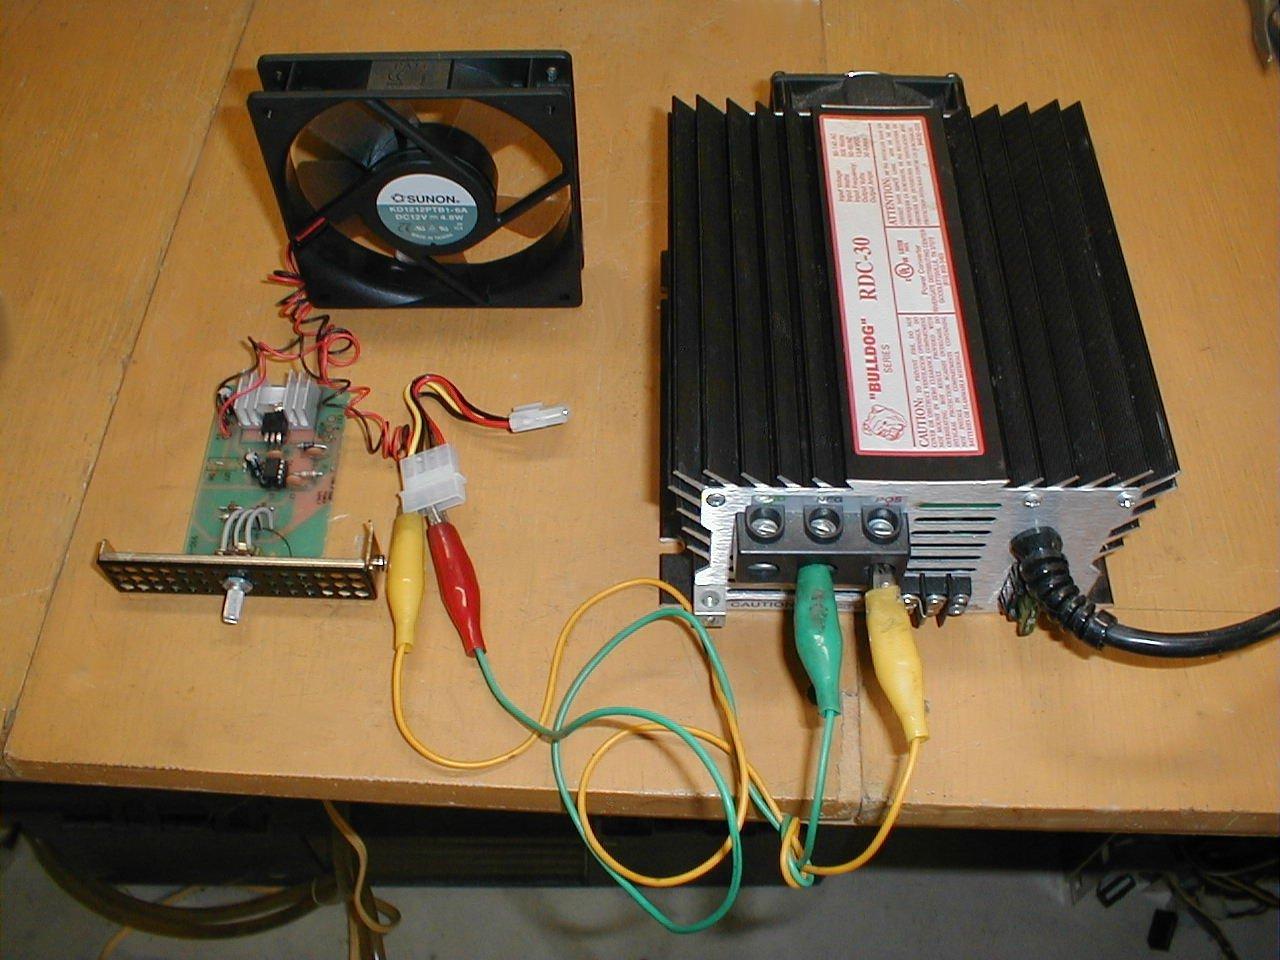 hight resolution of com fan speed controller